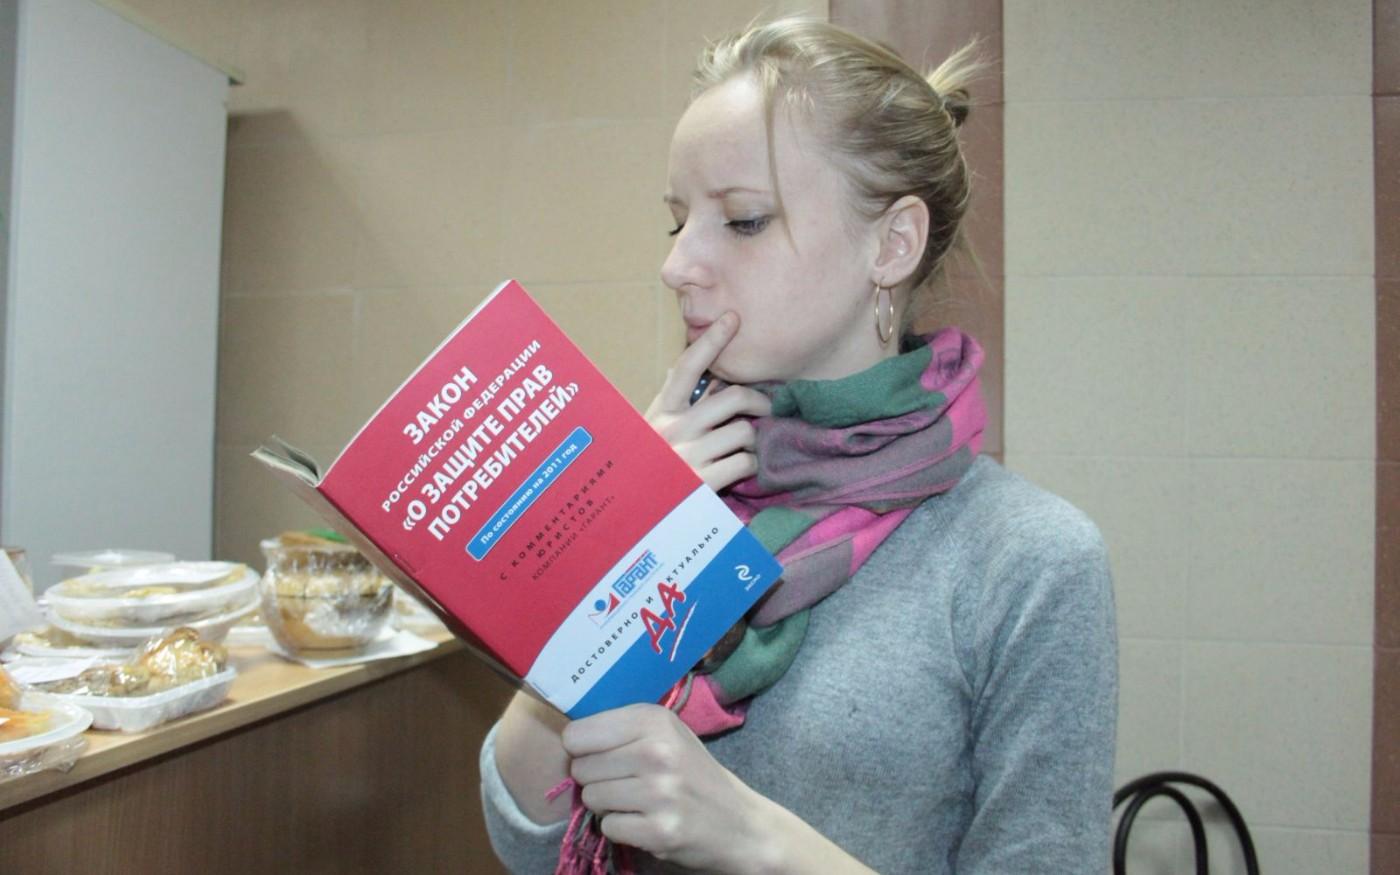 Жалоба на продавца в роспотребнадзор